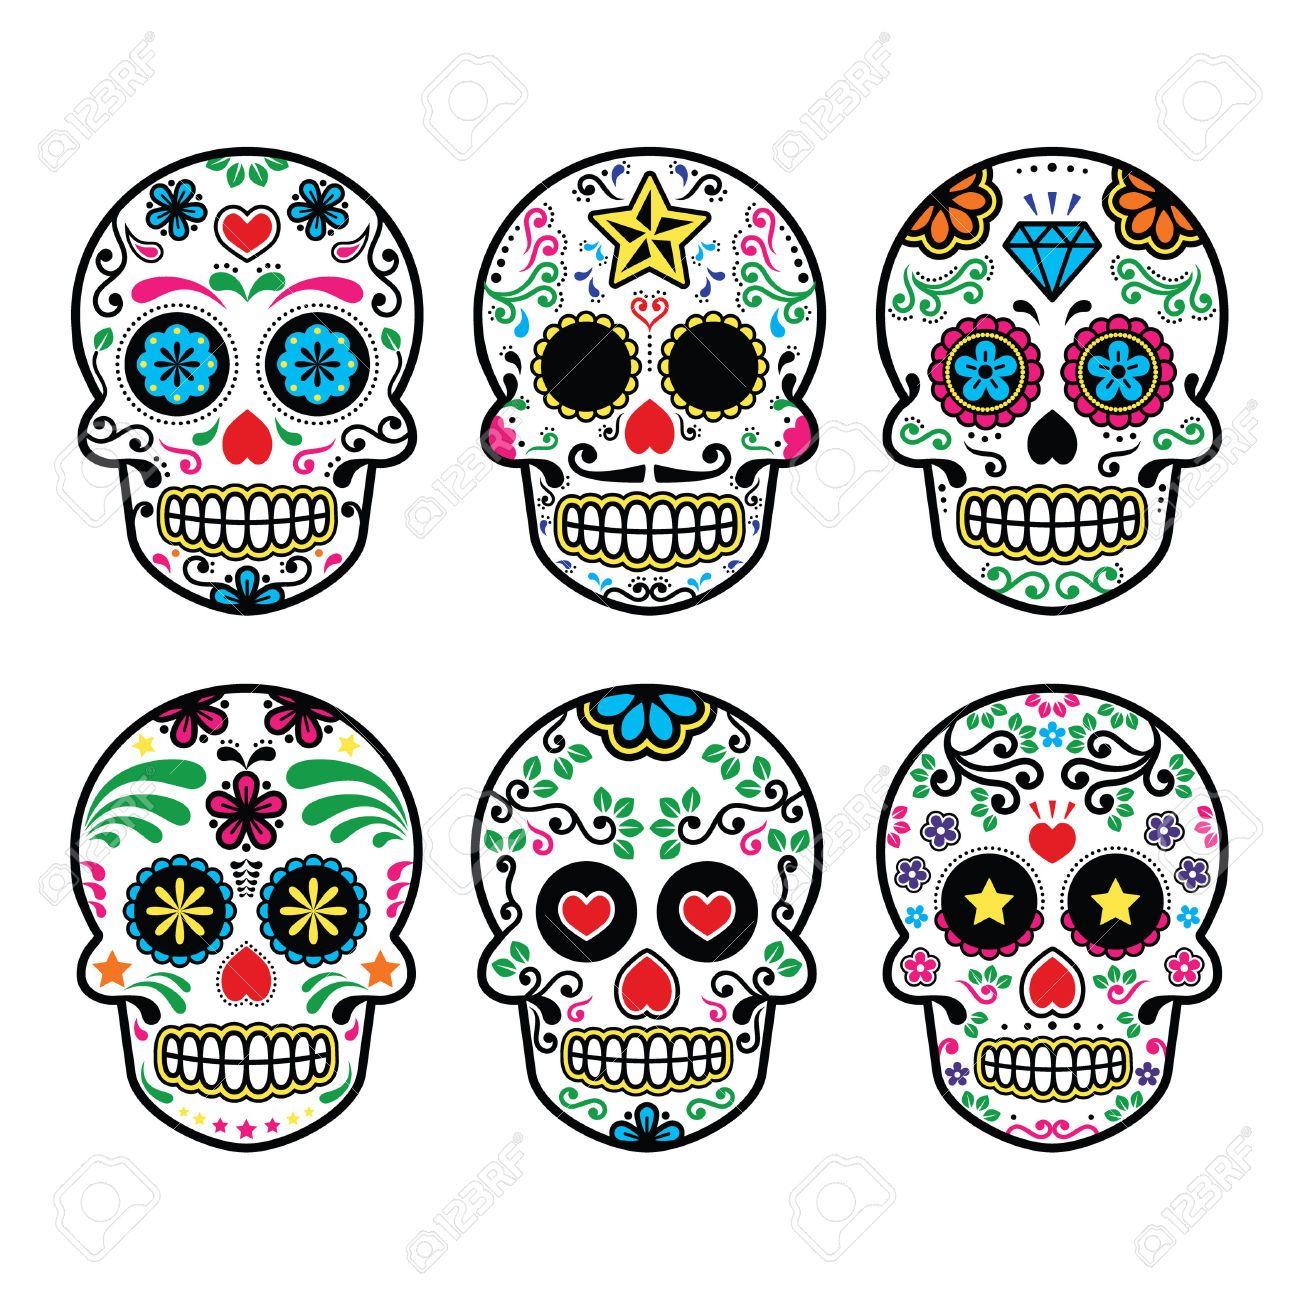 mexican sugar dancing - Пошук Google | stitching ...